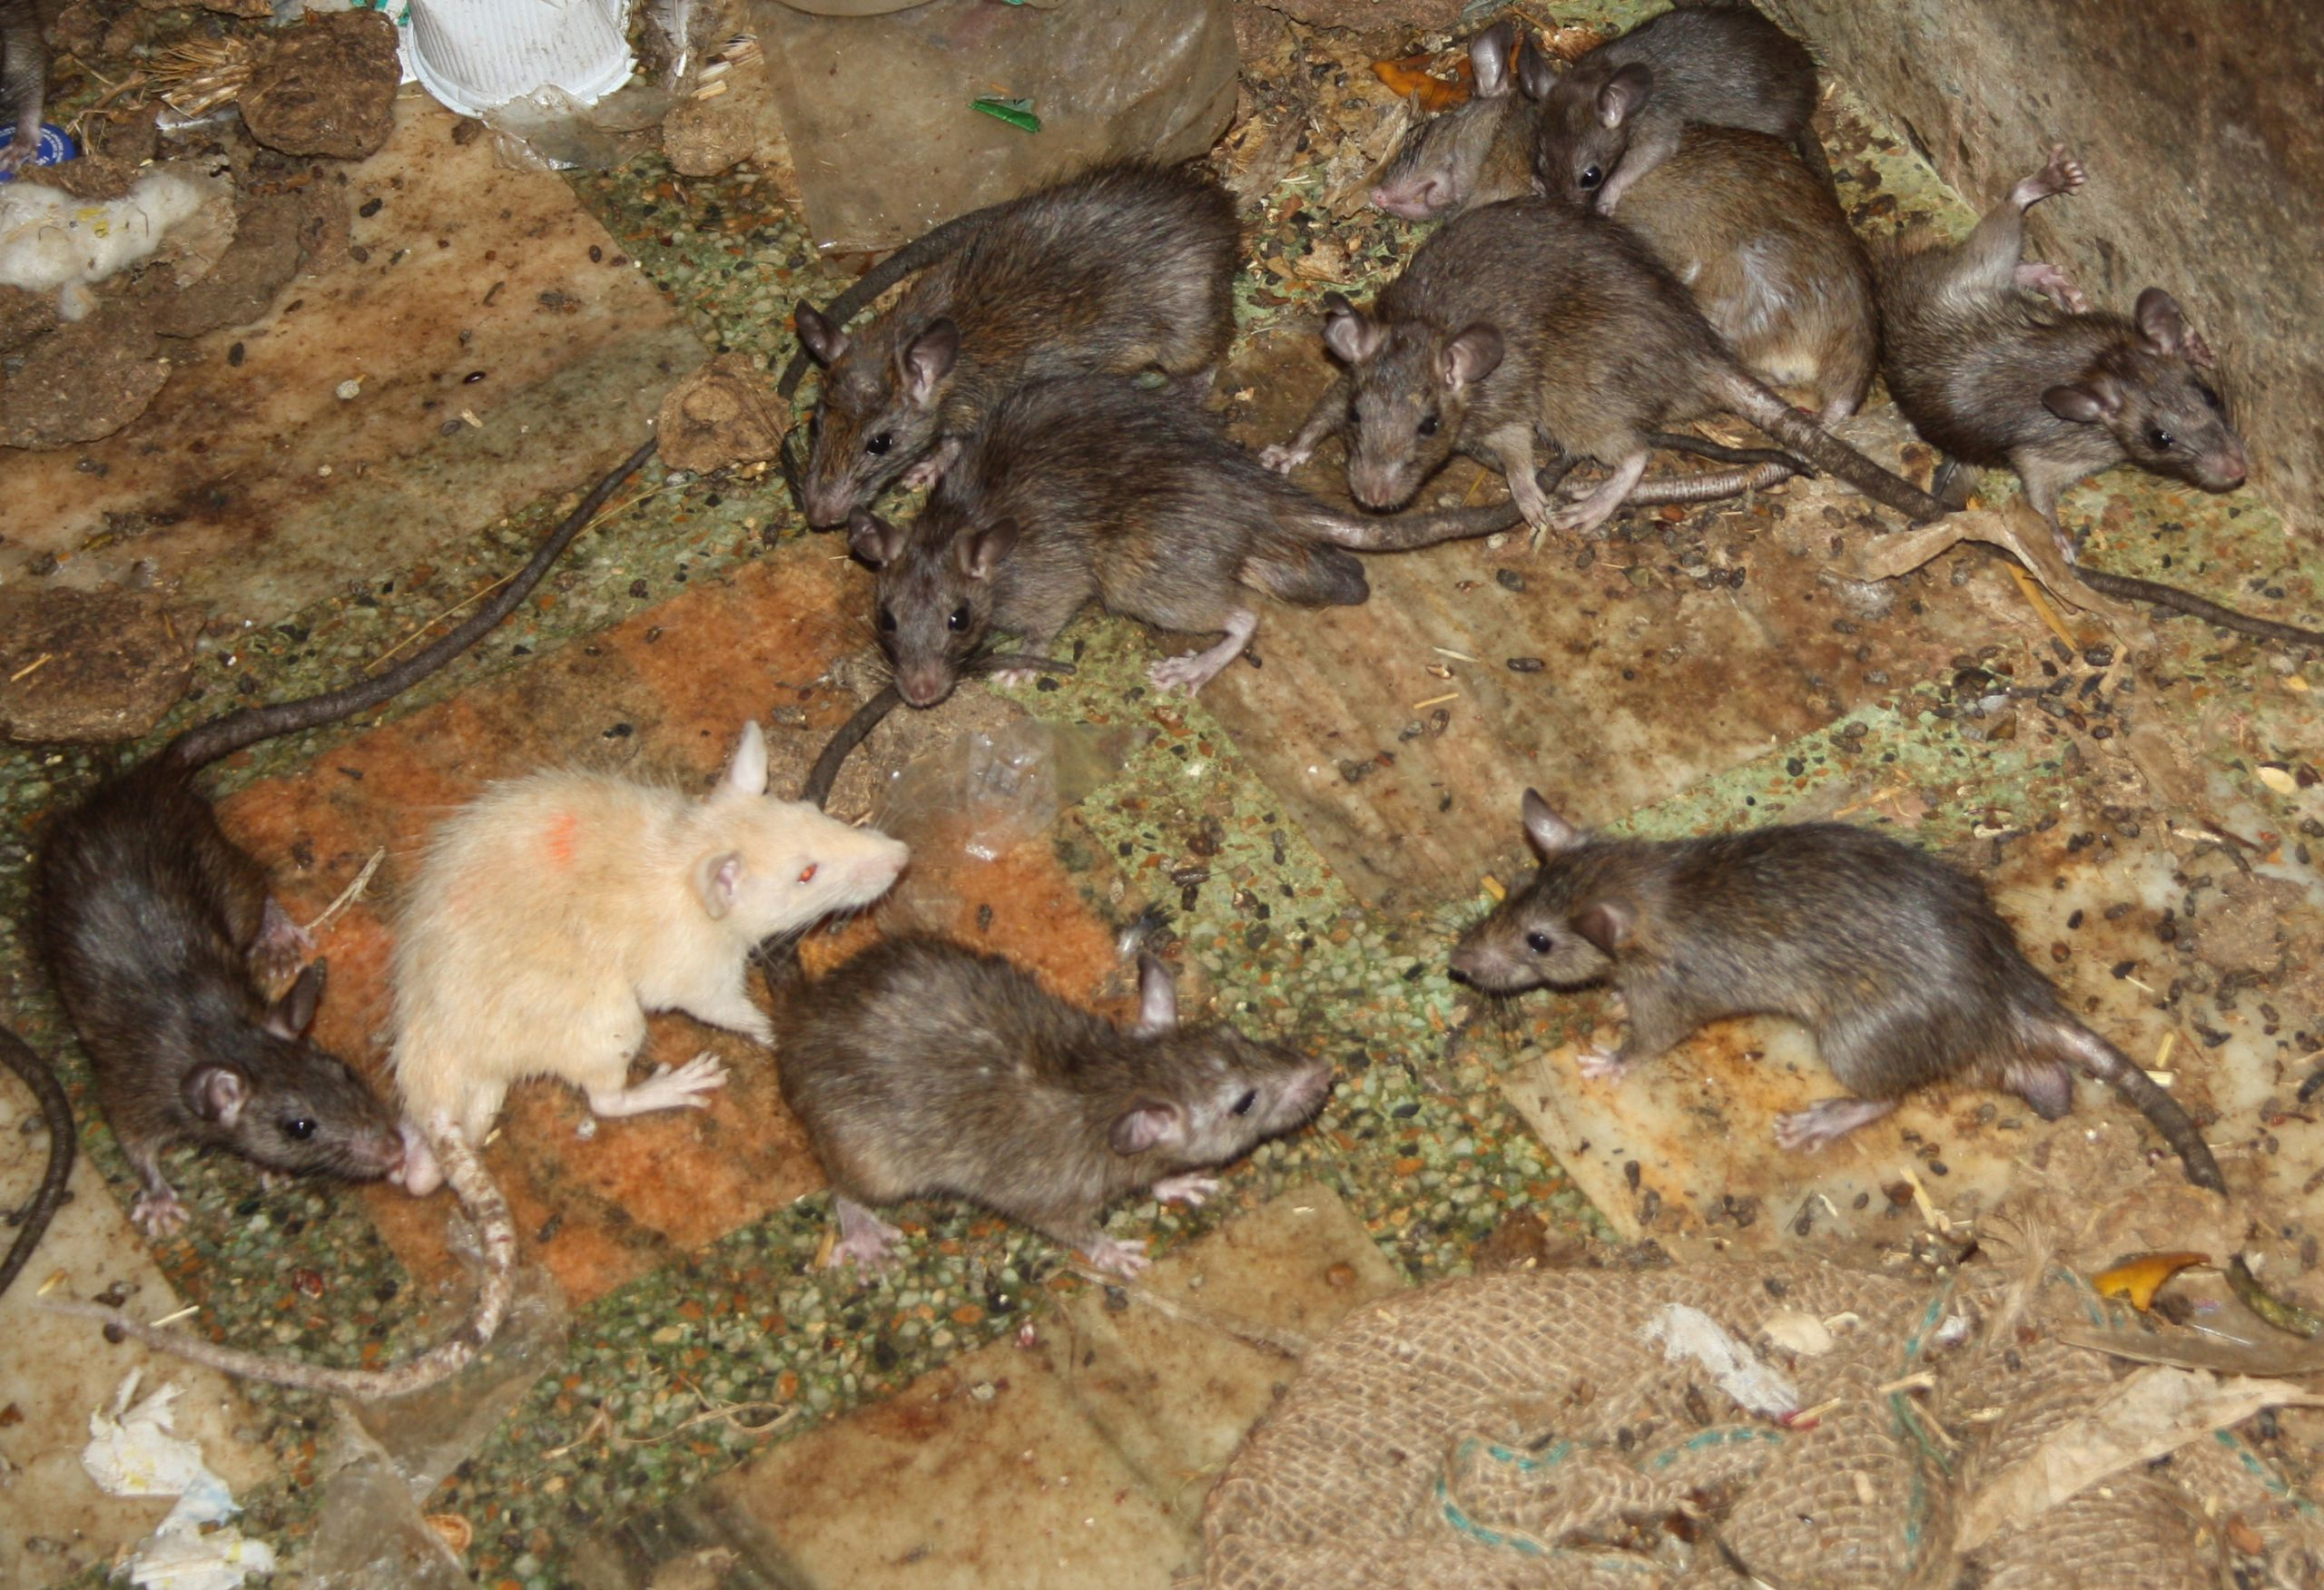 White rat at the temple of Karni Mata